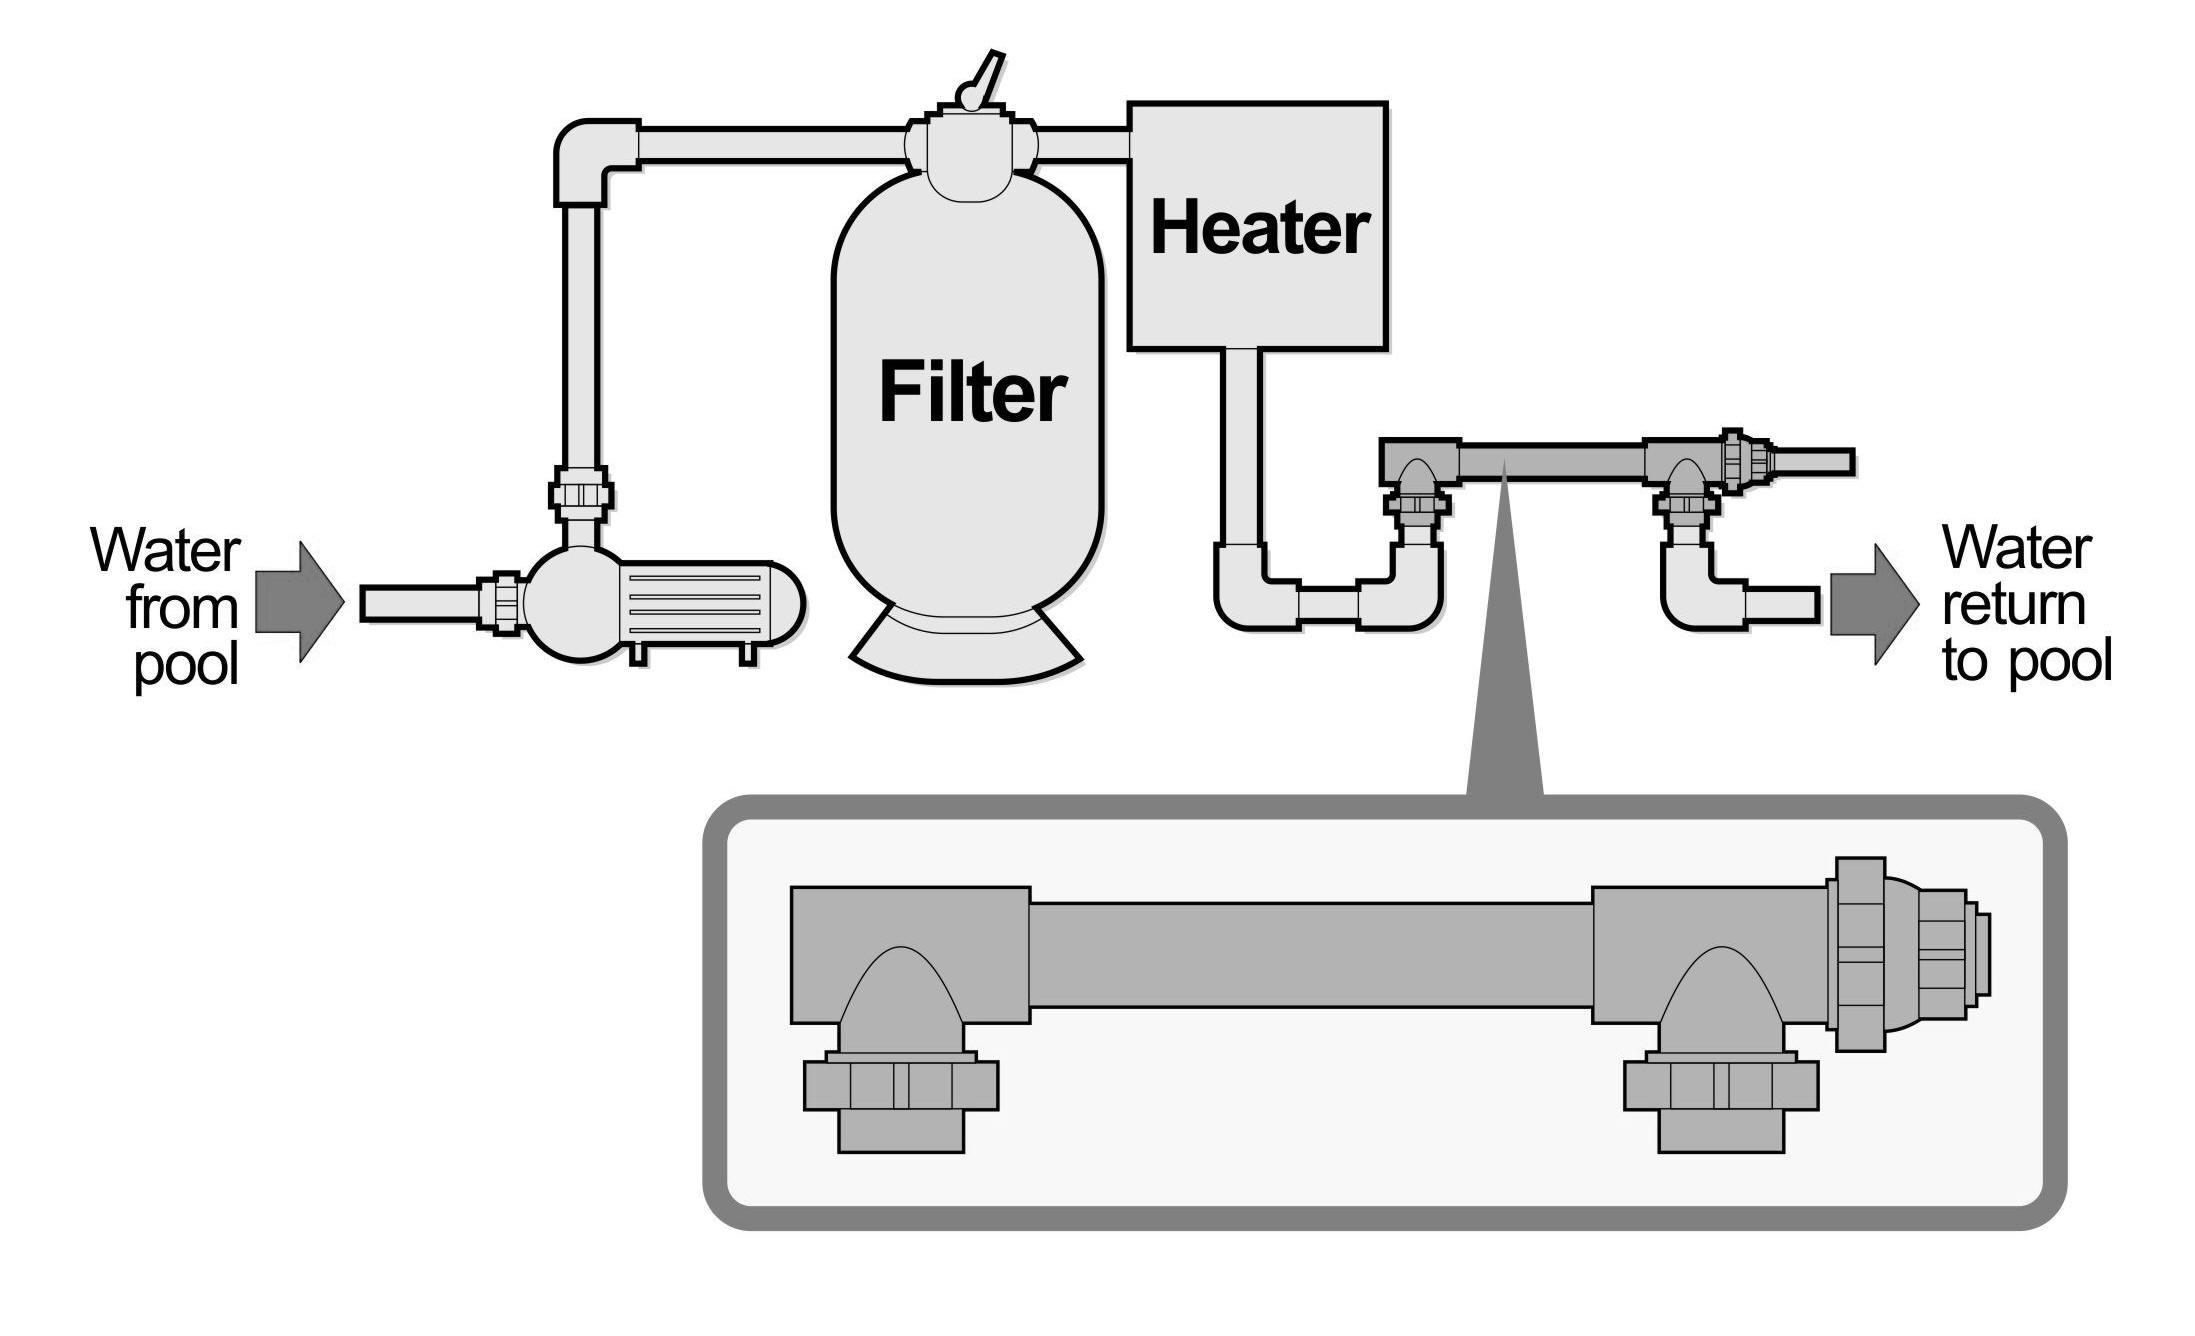 Fine Wiring Diagram Uv Light Basic Electronics Wiring Diagram Online Wiring Library Findwiringprosboompriceit